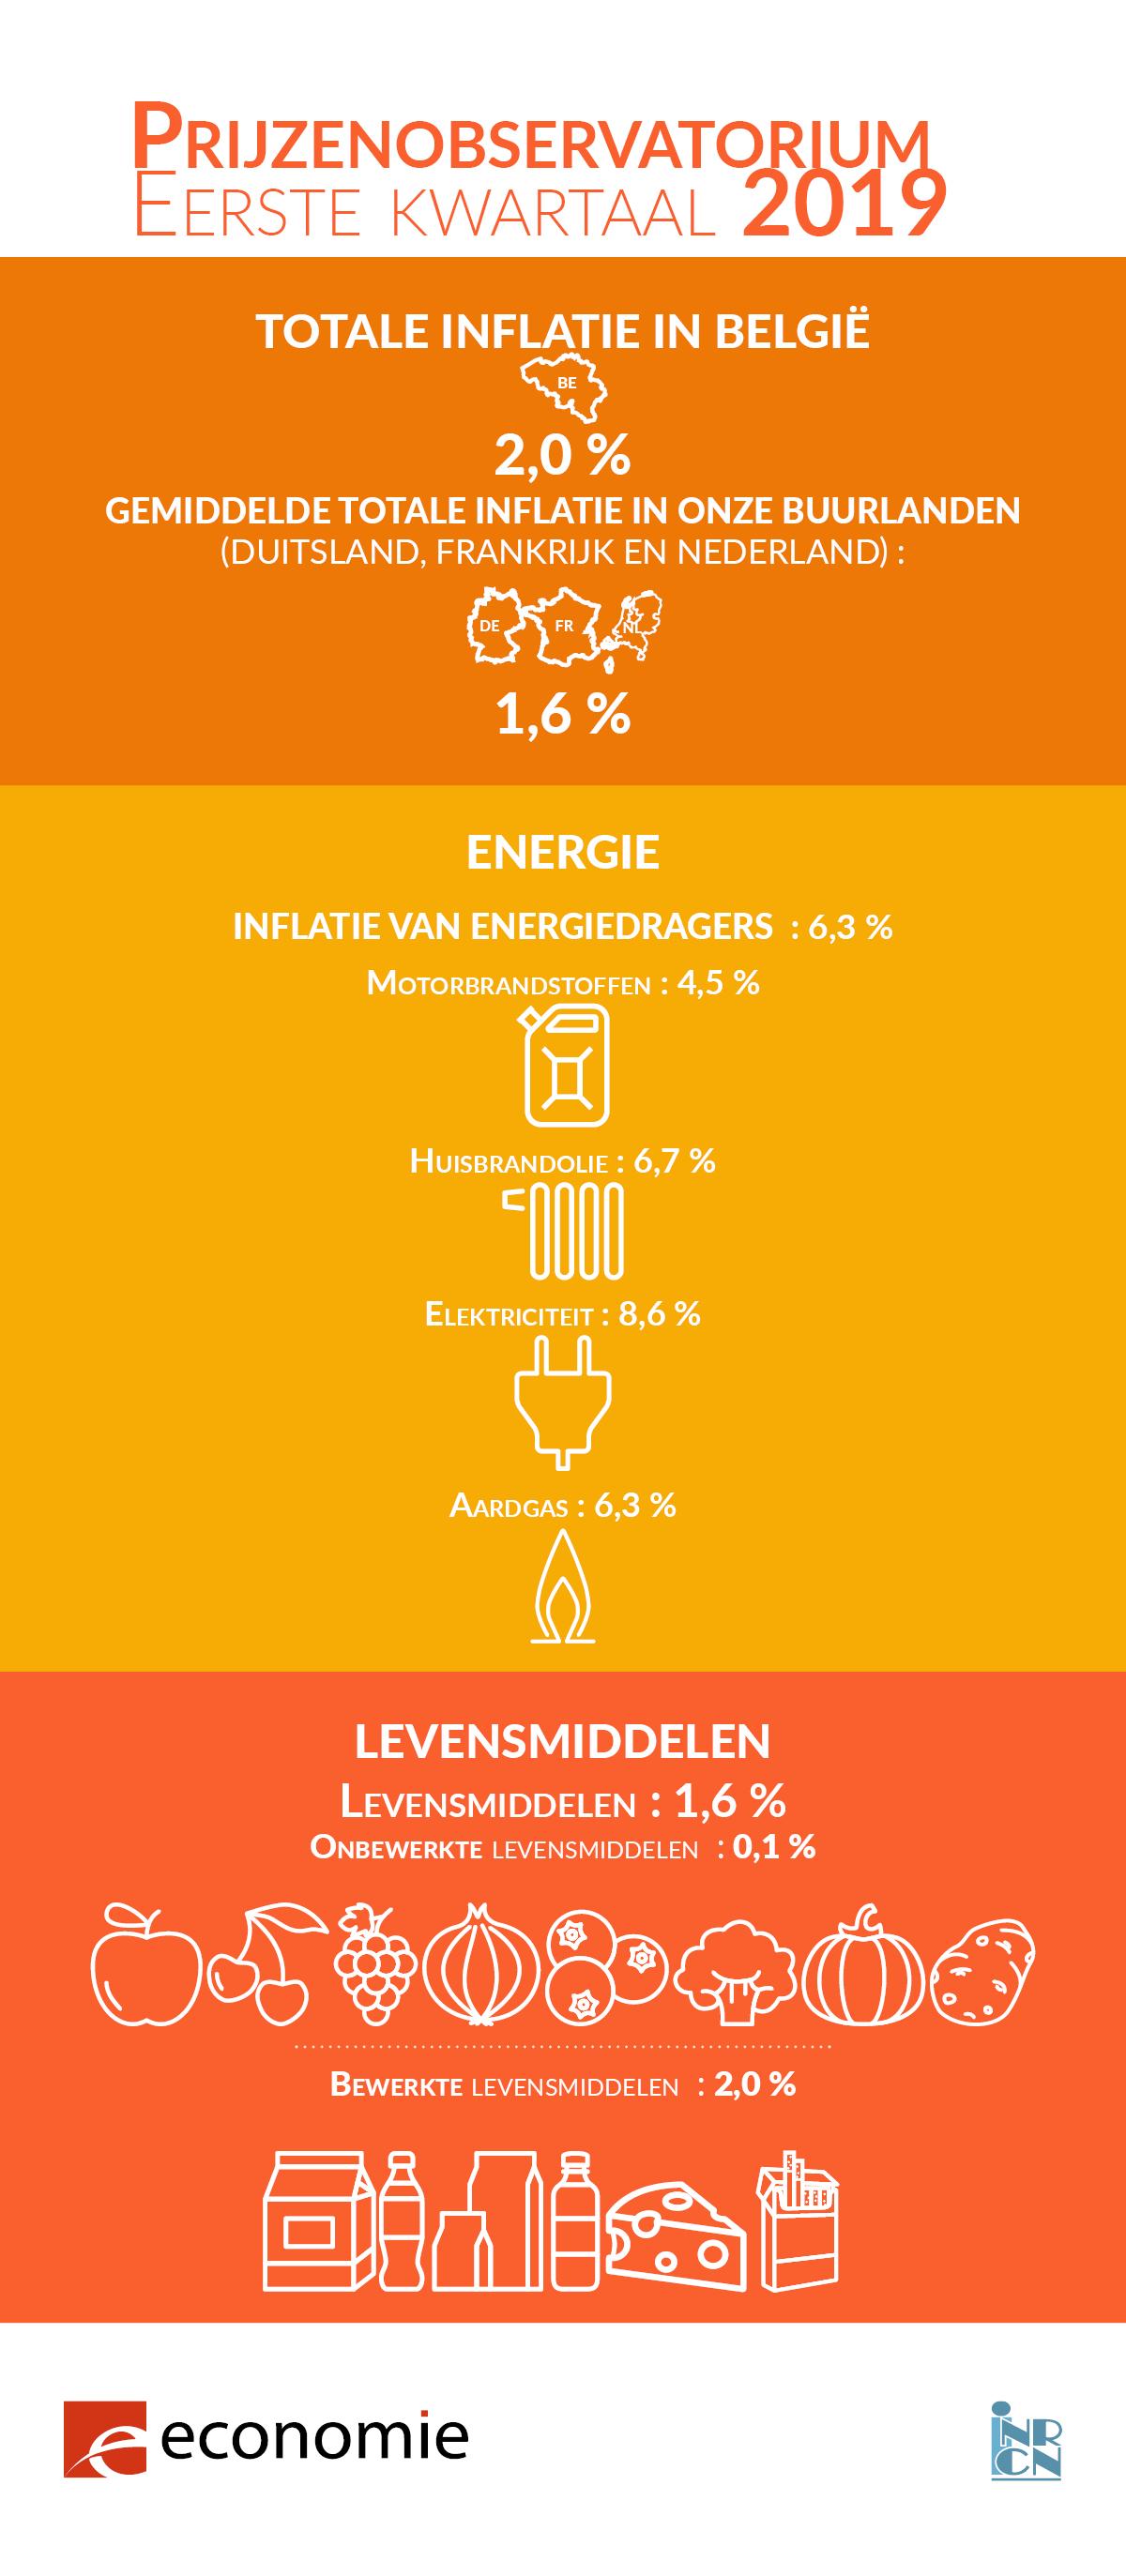 311981 104 19 infographie nl 9c8ad6 original 1557495378